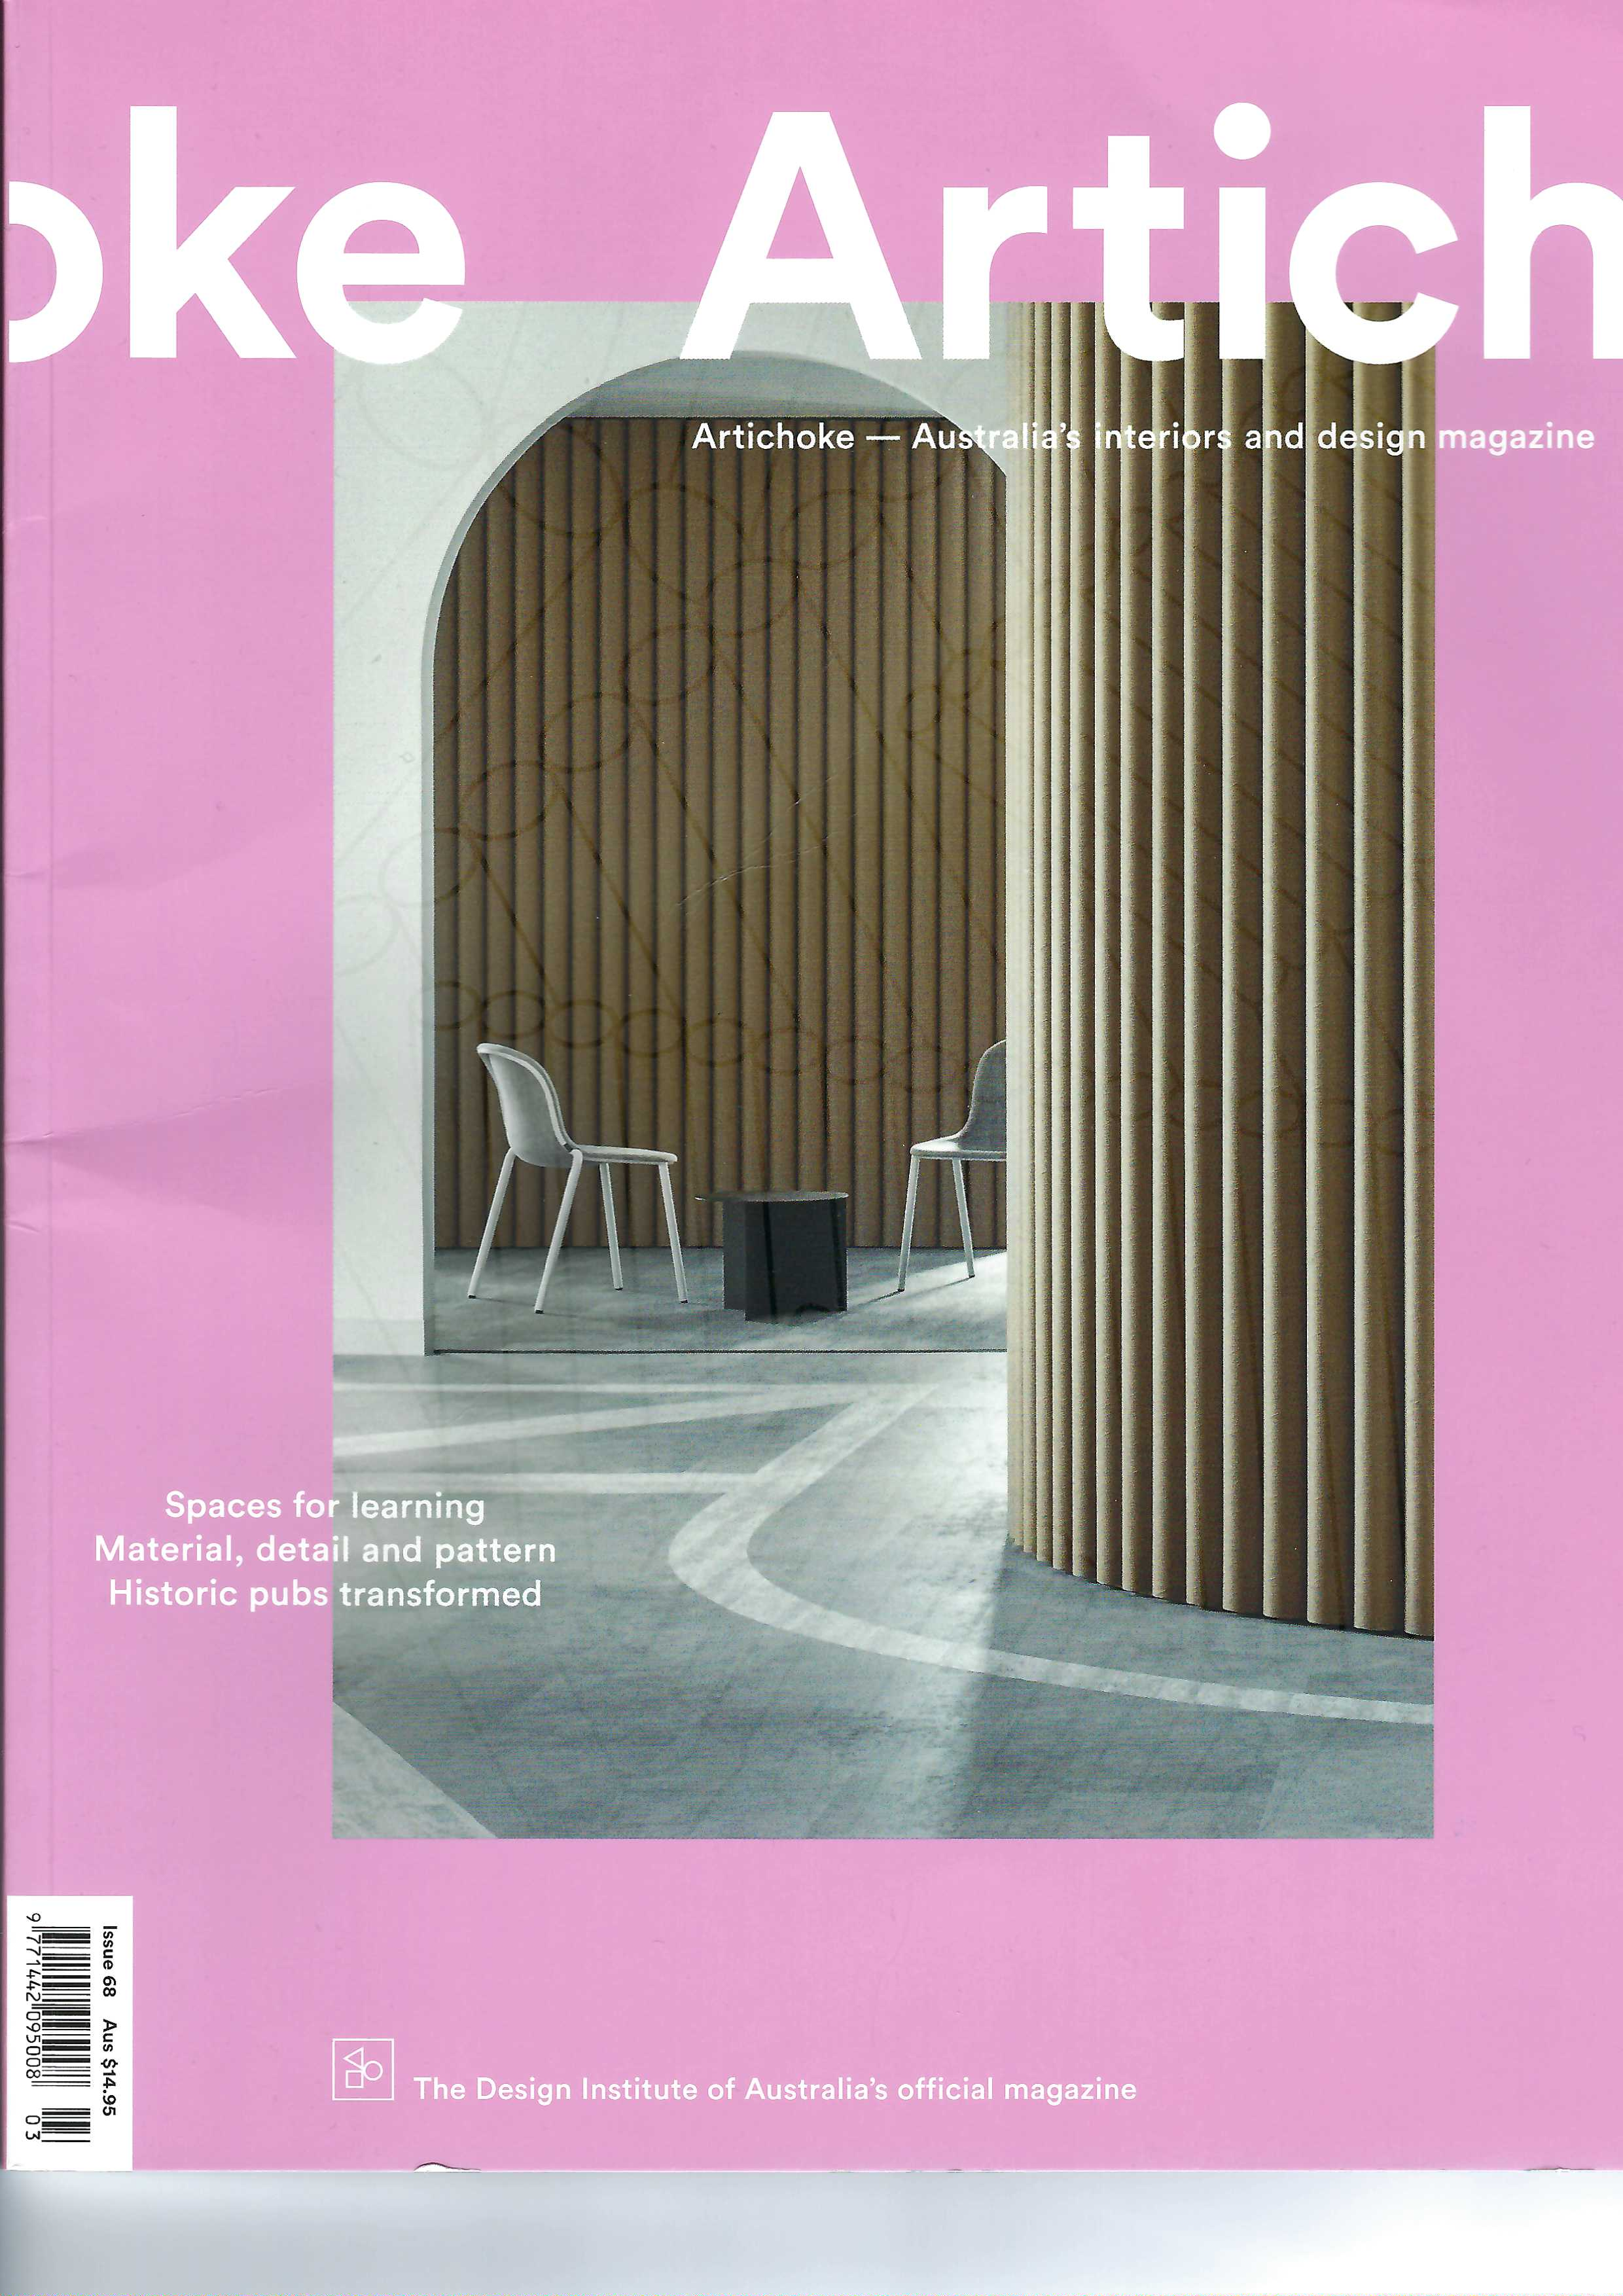 artichoke-magazine-cover-spring-19.jpeg